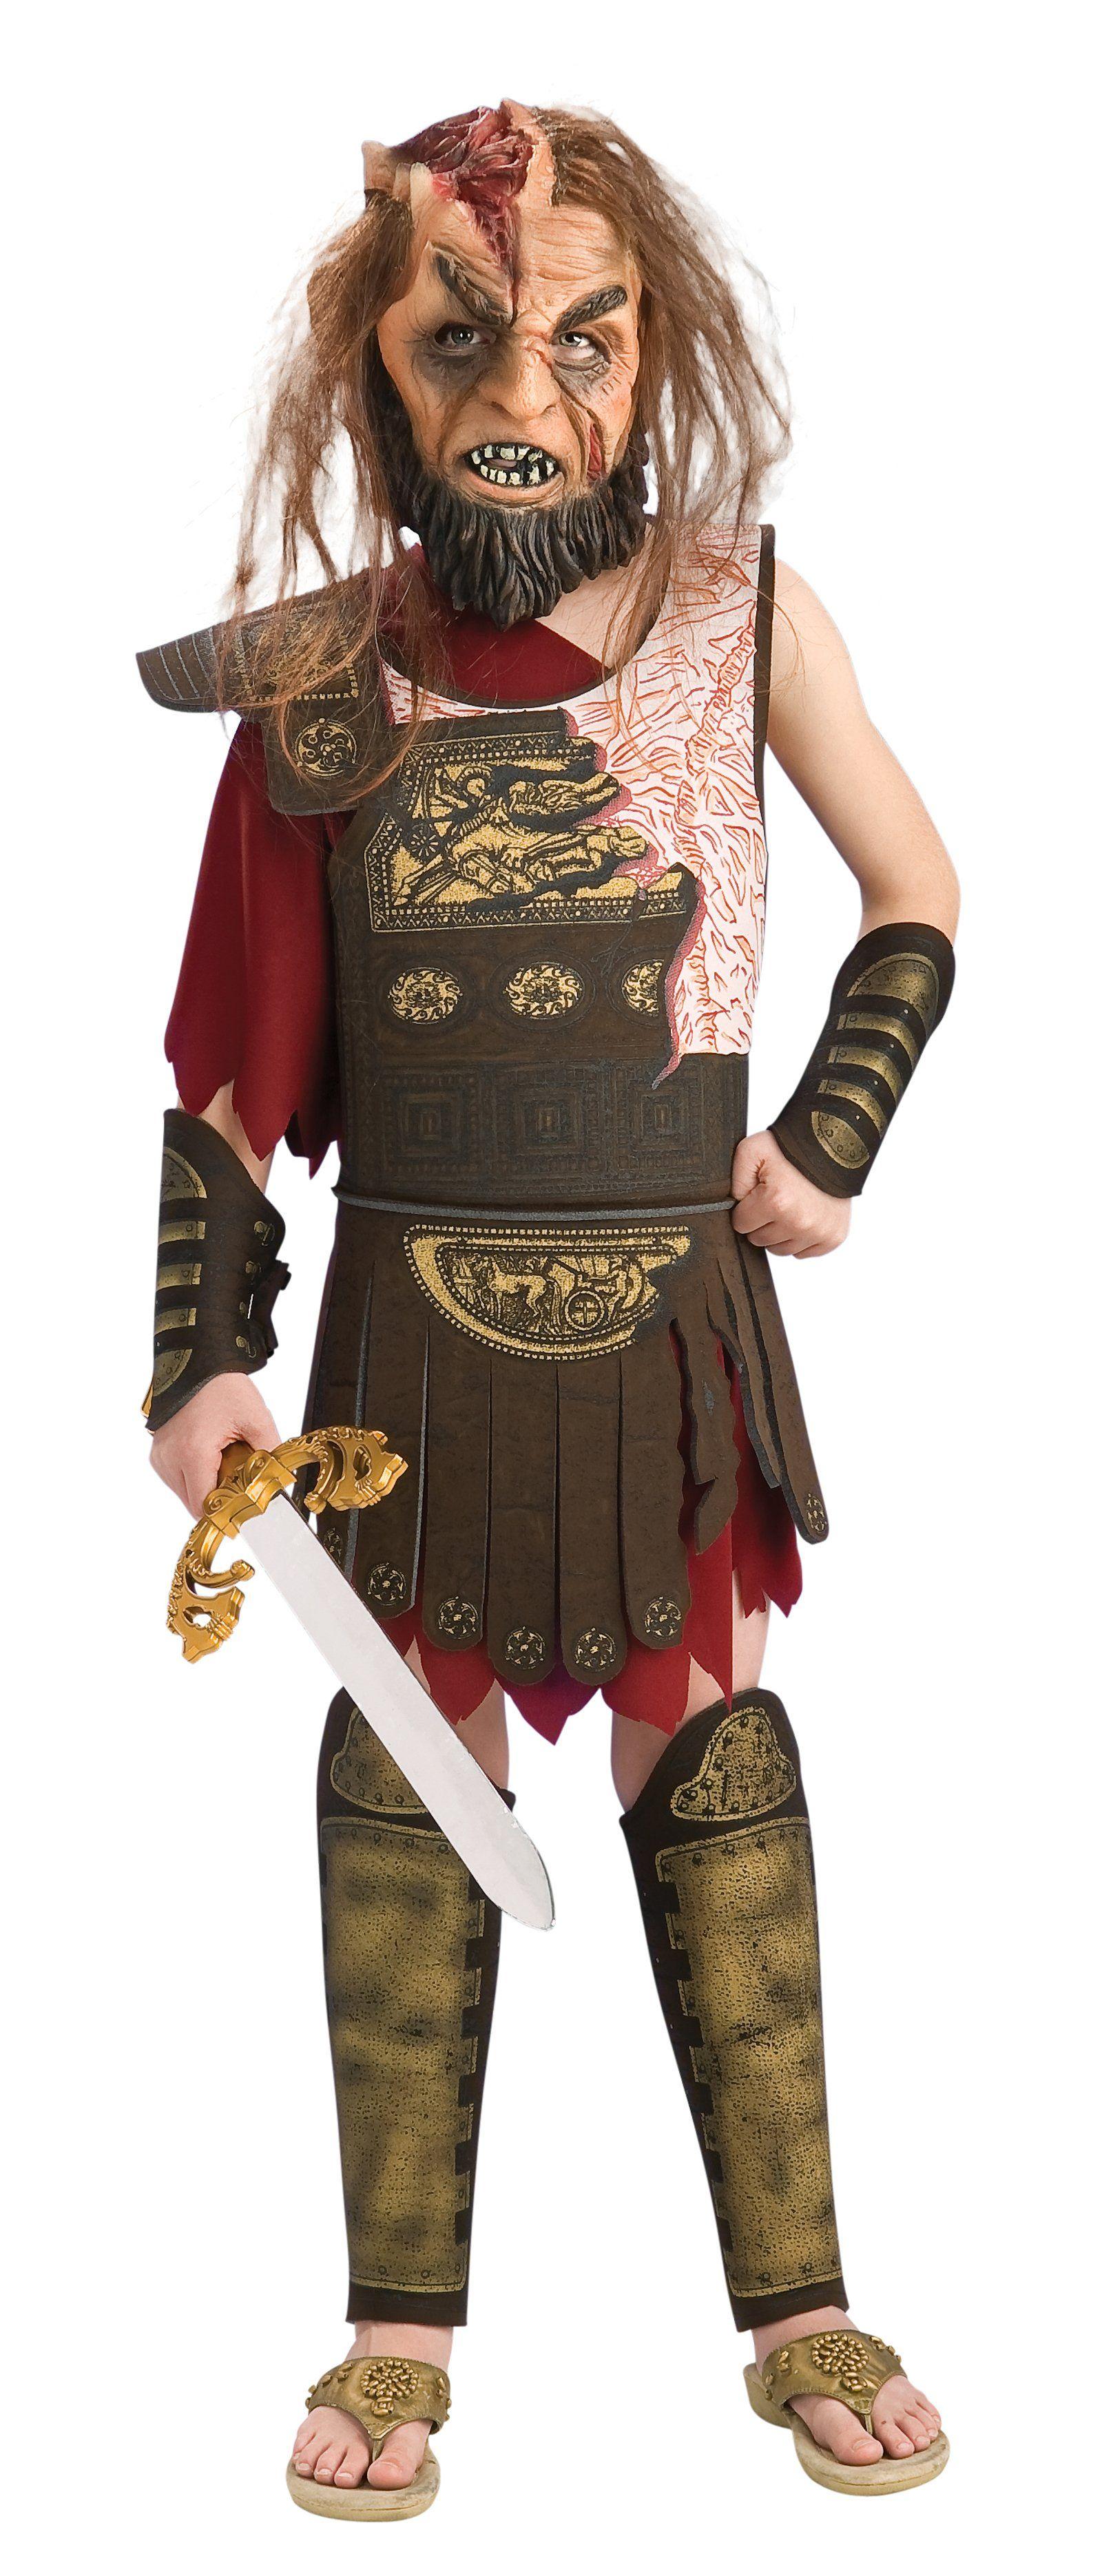 Zeus costume kids best kids costumes edward zeus clash of the ans calibos child costume solutioingenieria Images